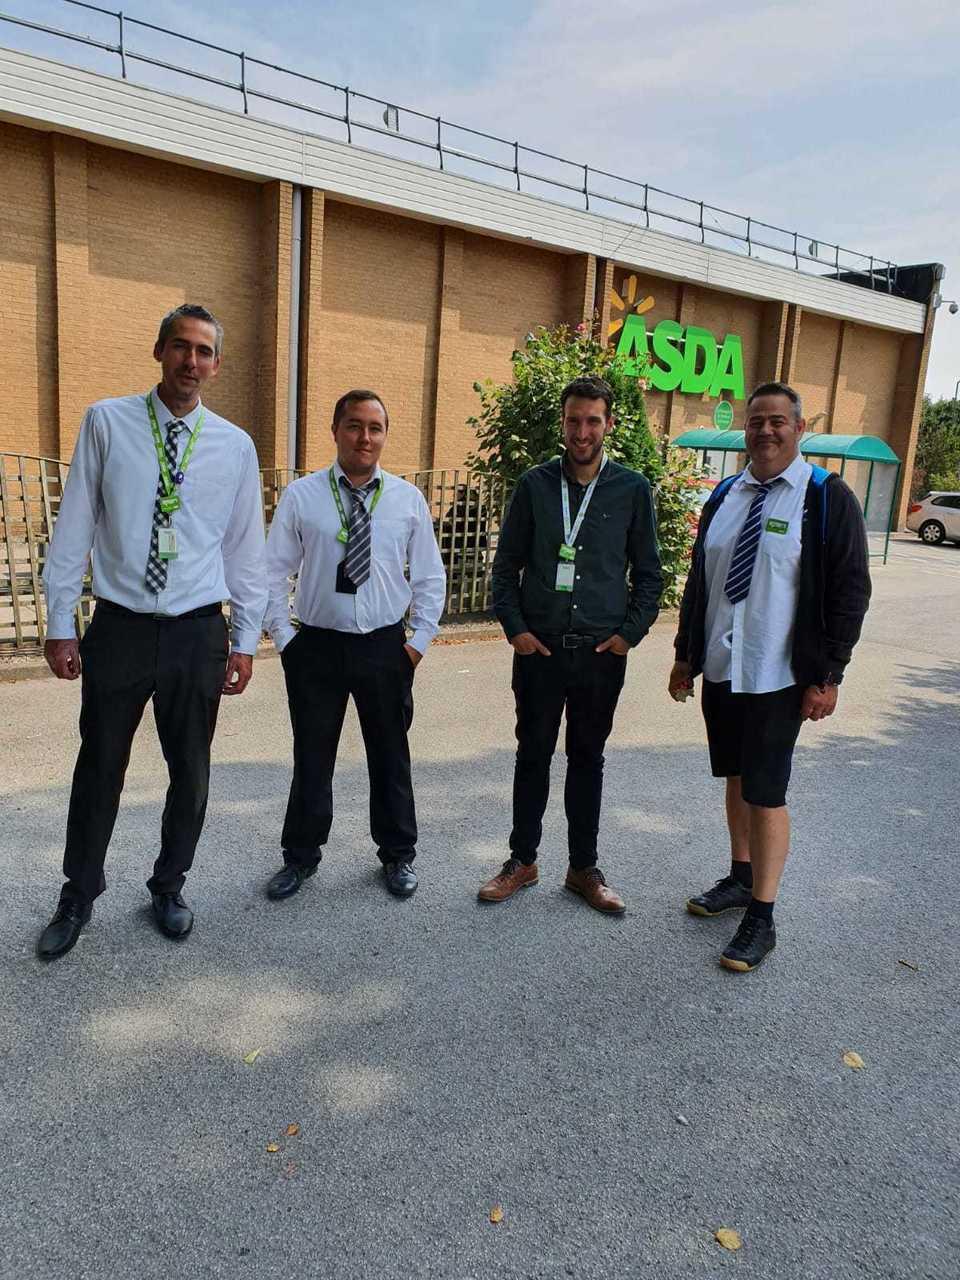 Celebrating back to school | Asda Derby